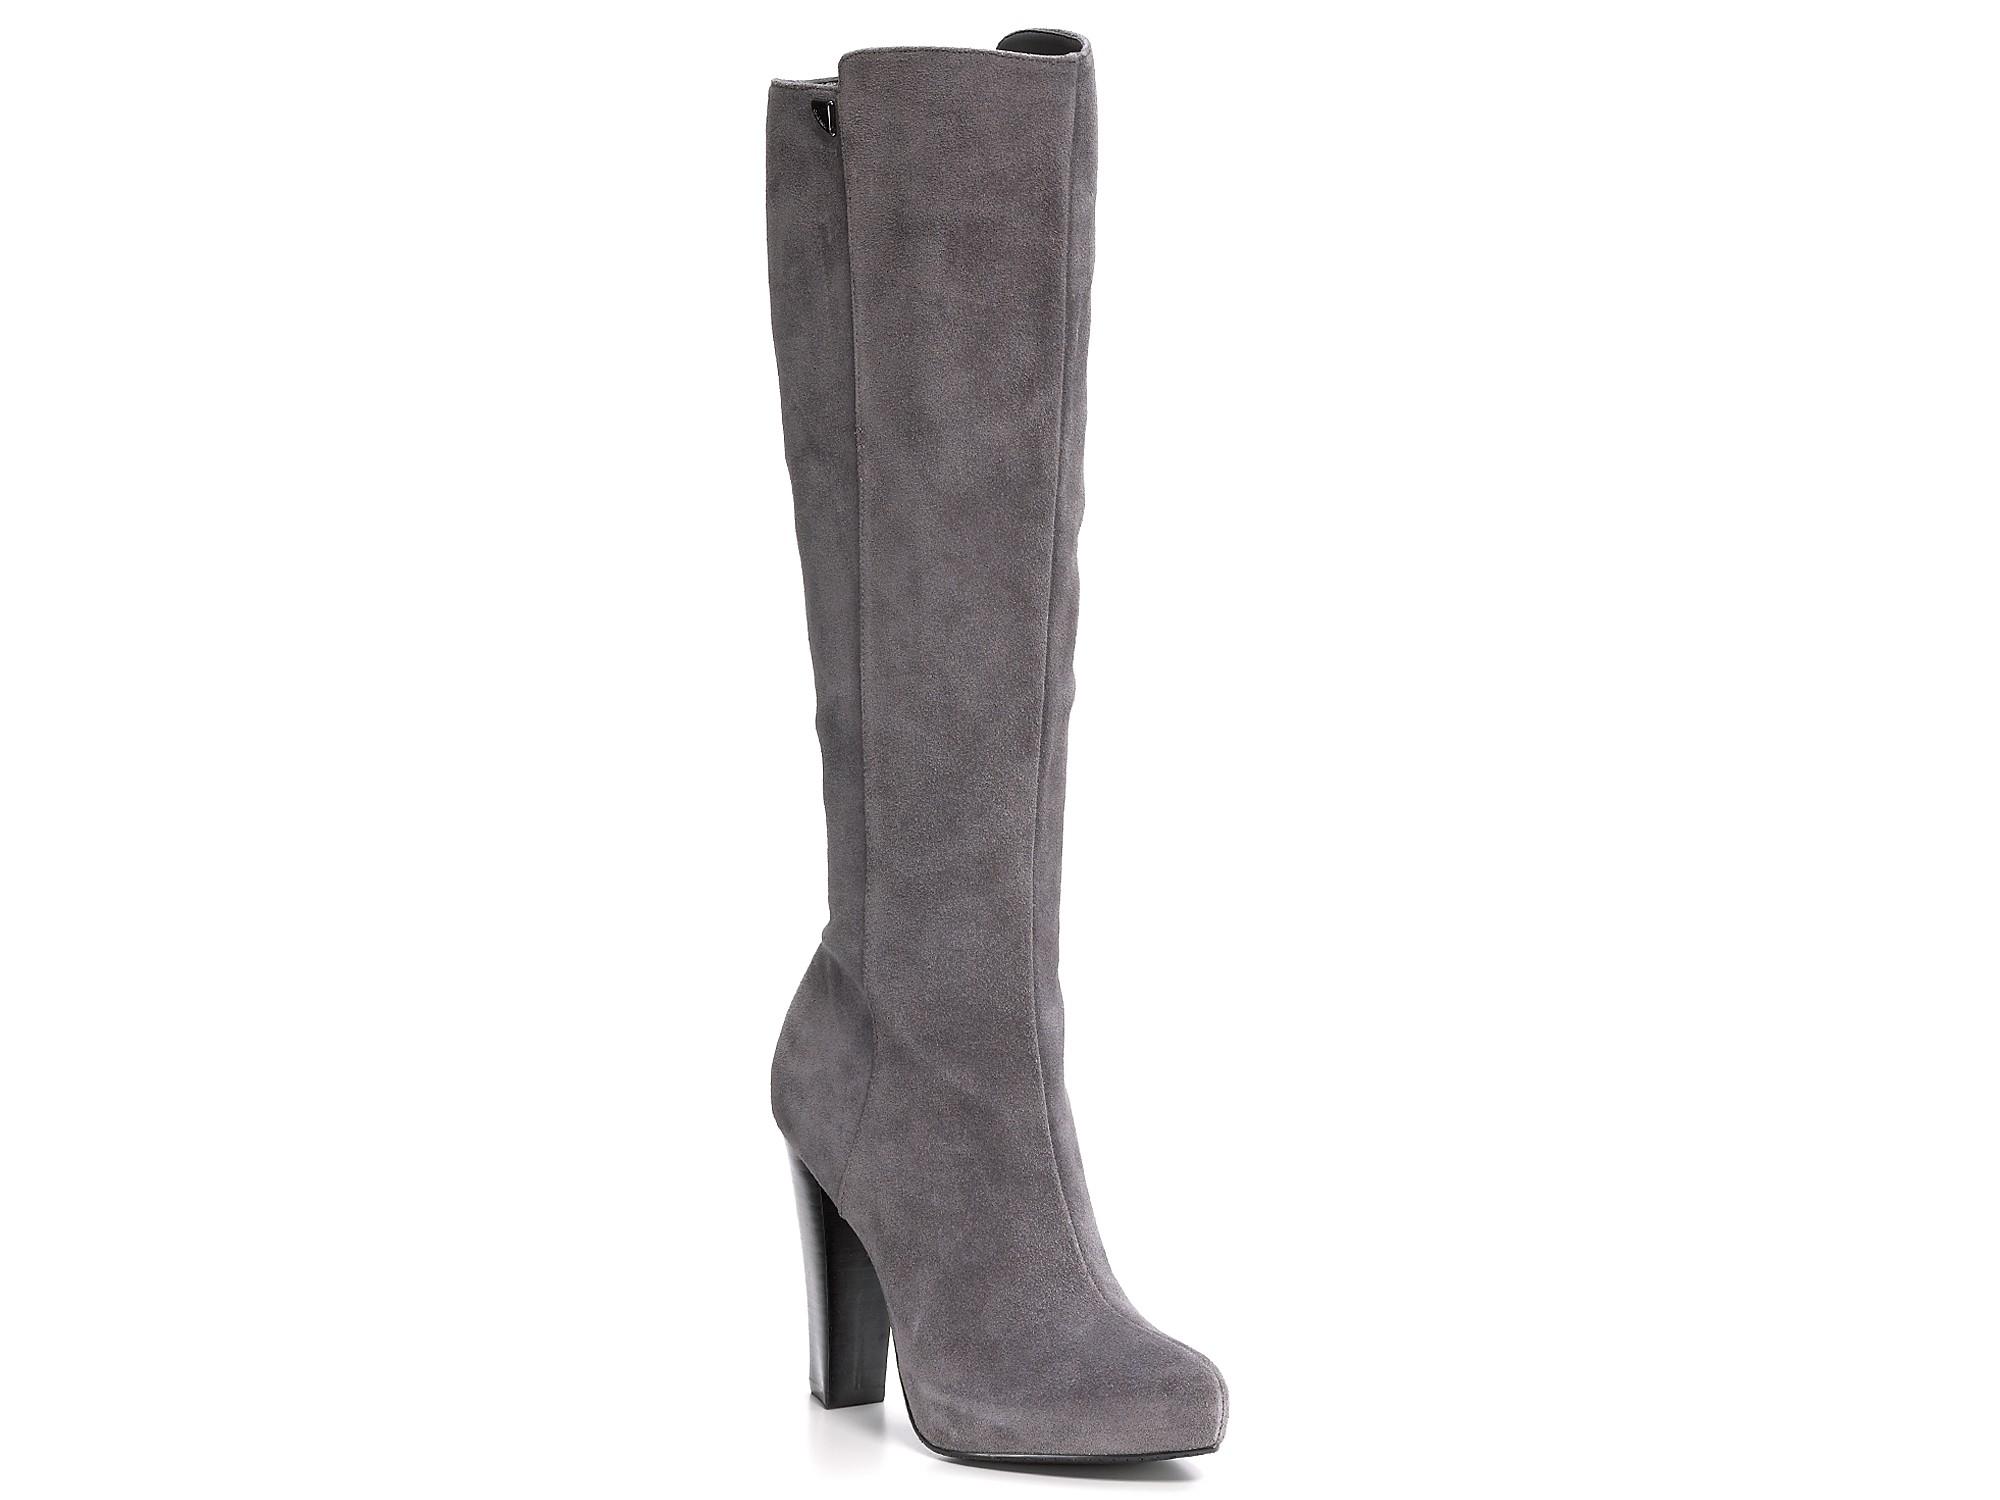 calvin klein eliana boots in gray grey suede lyst